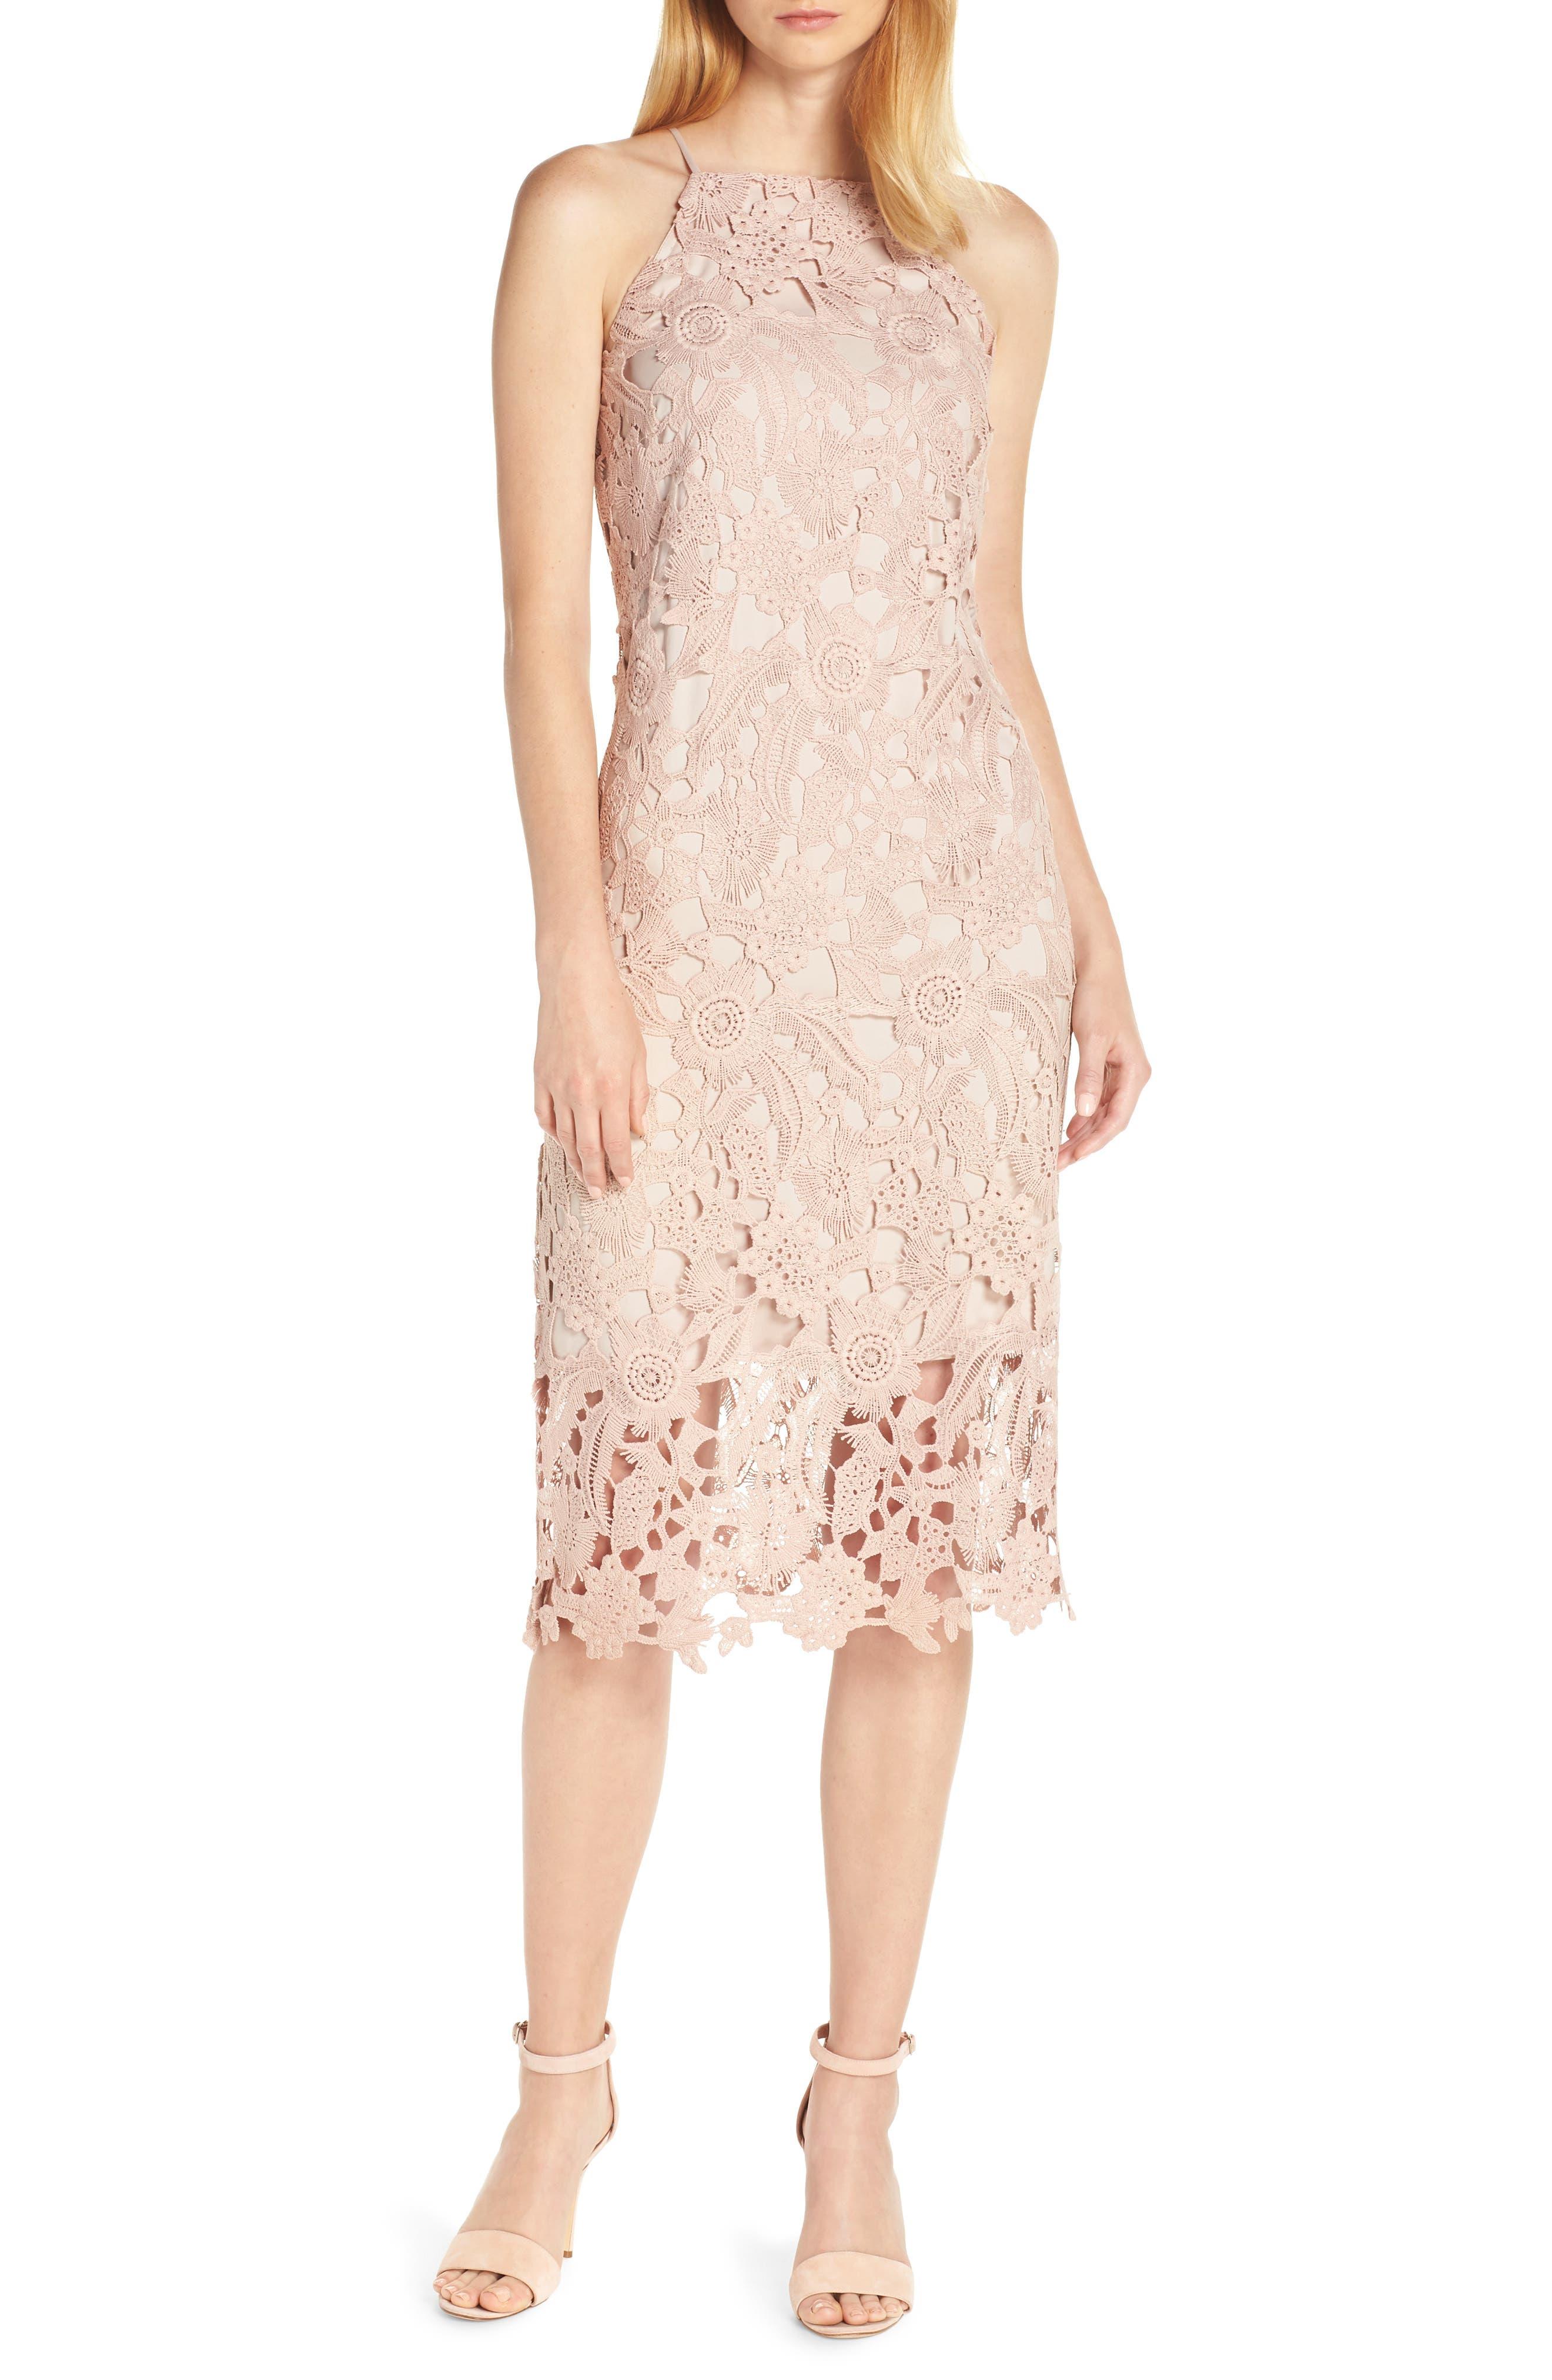 Sam Edelman Halter Top Lace Dress, Pink